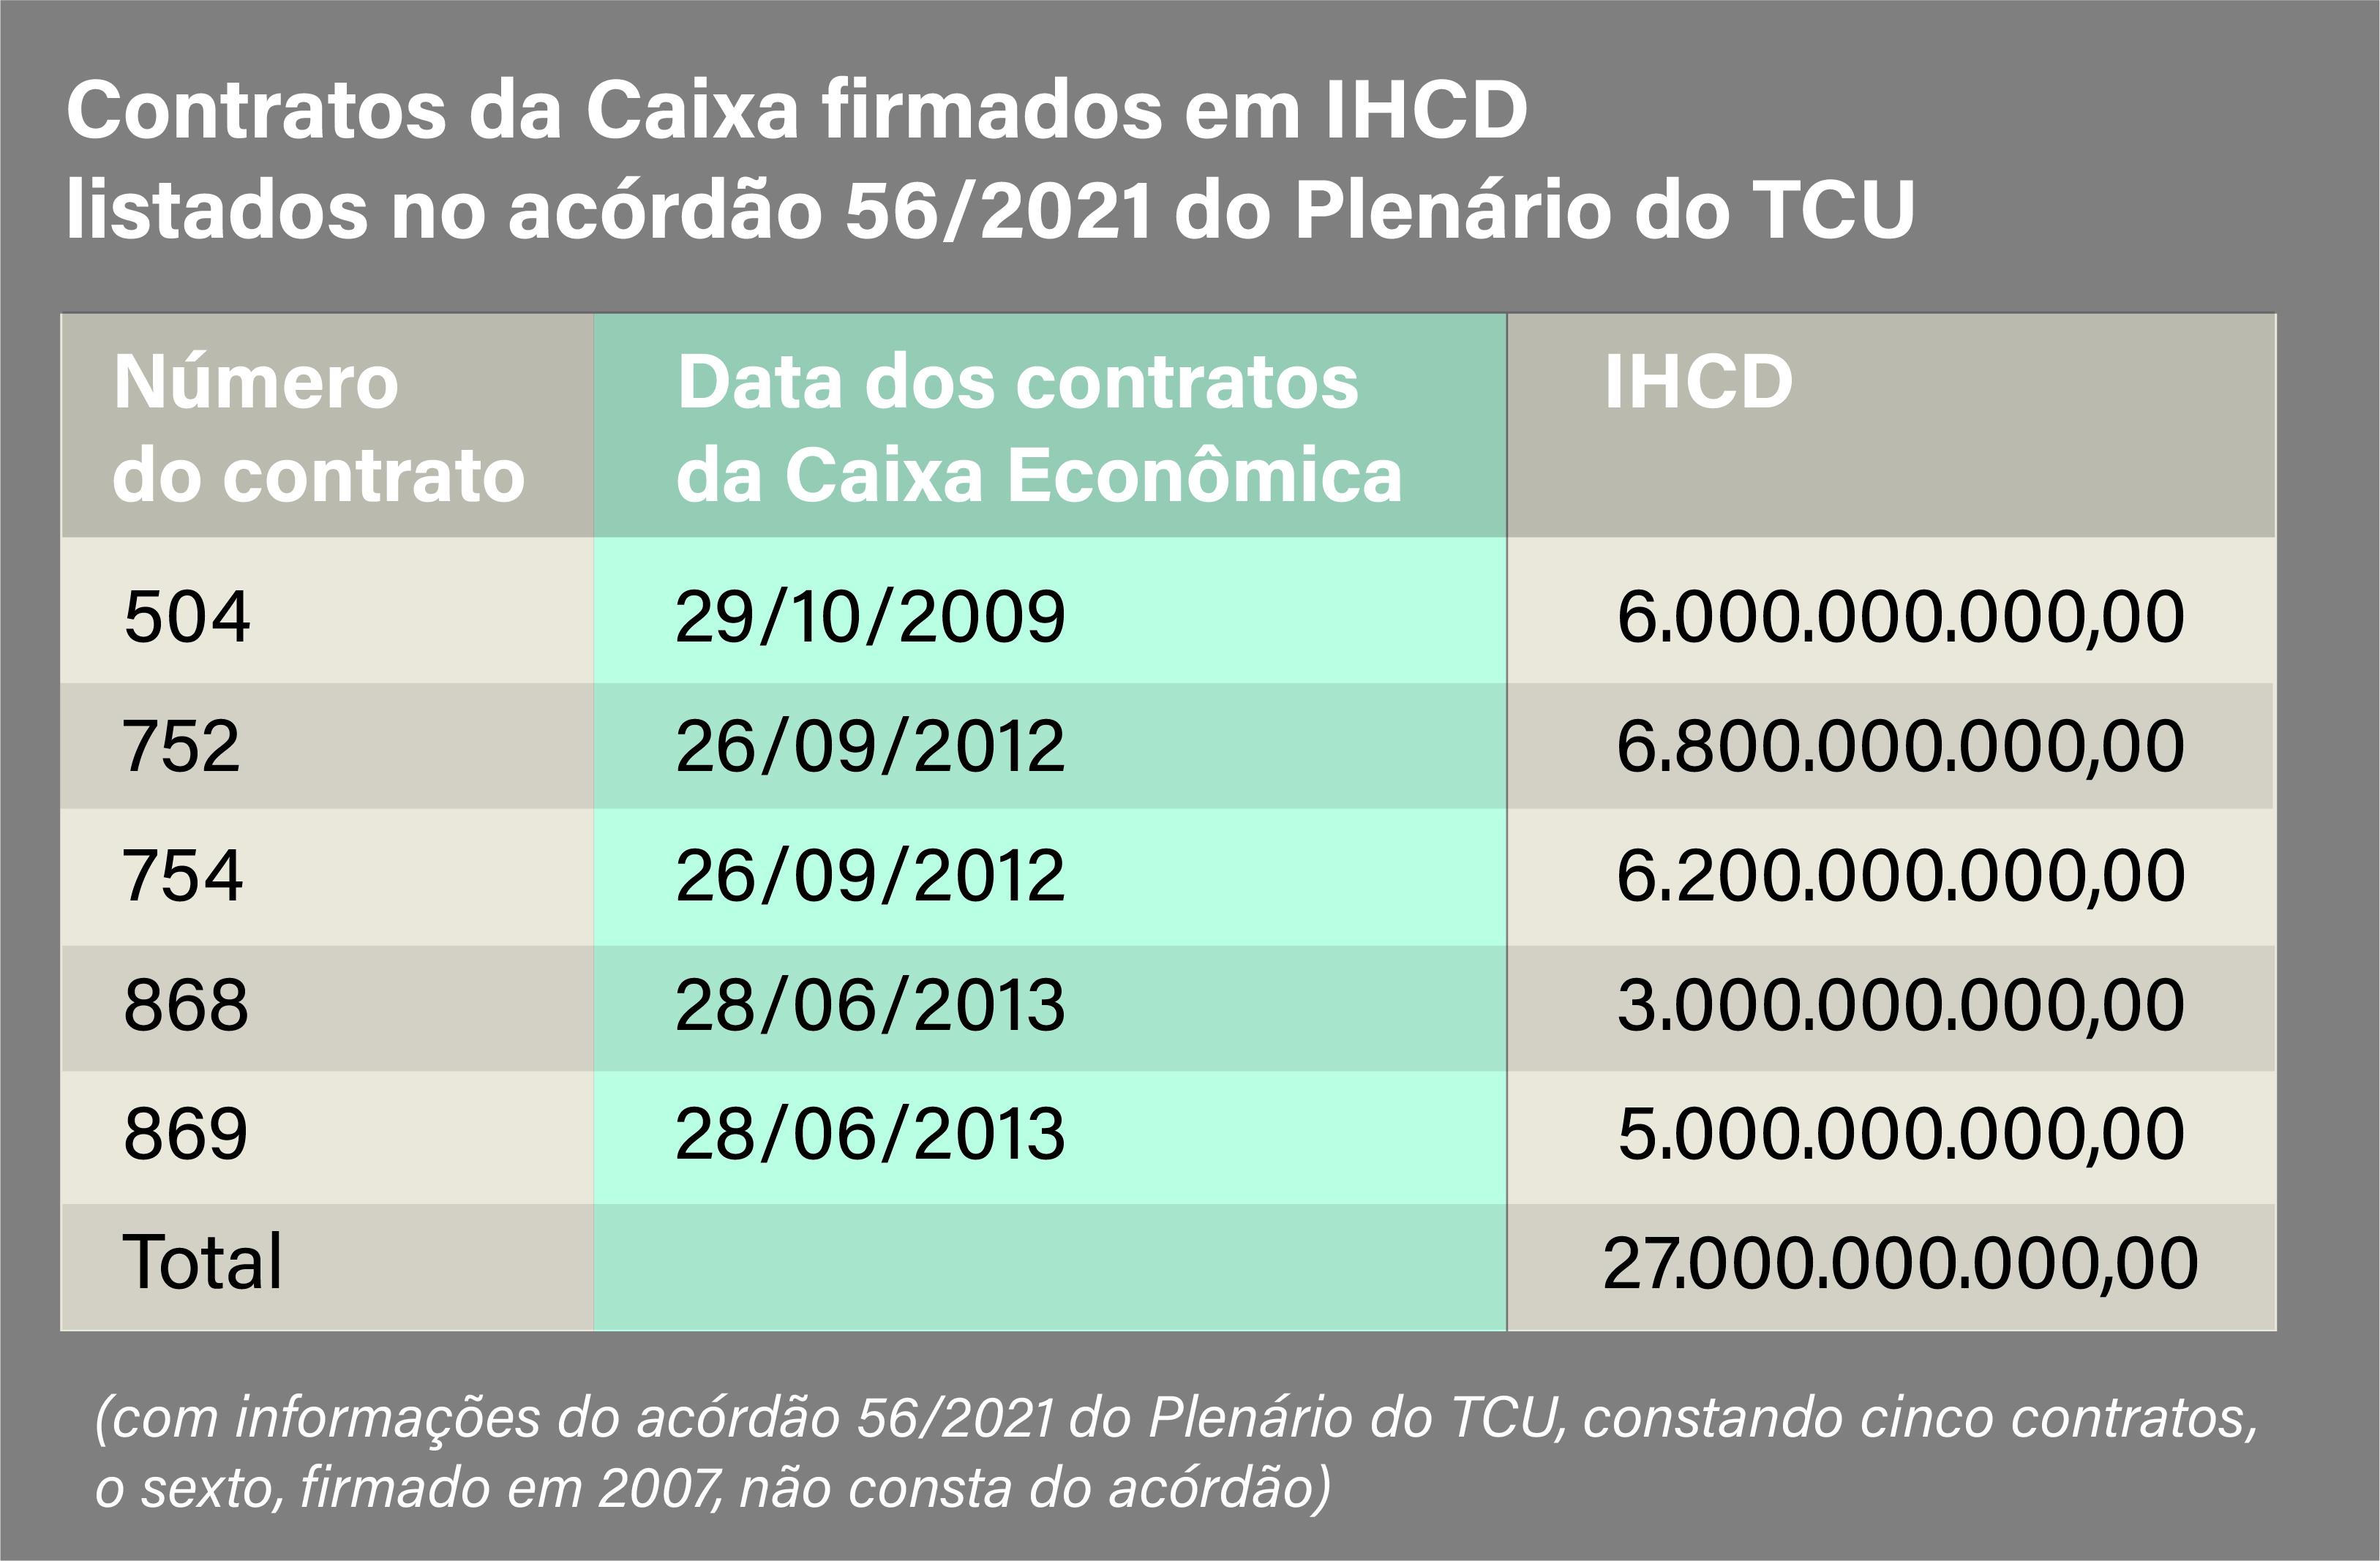 20210521PeriodocontratosCaixa.jpg